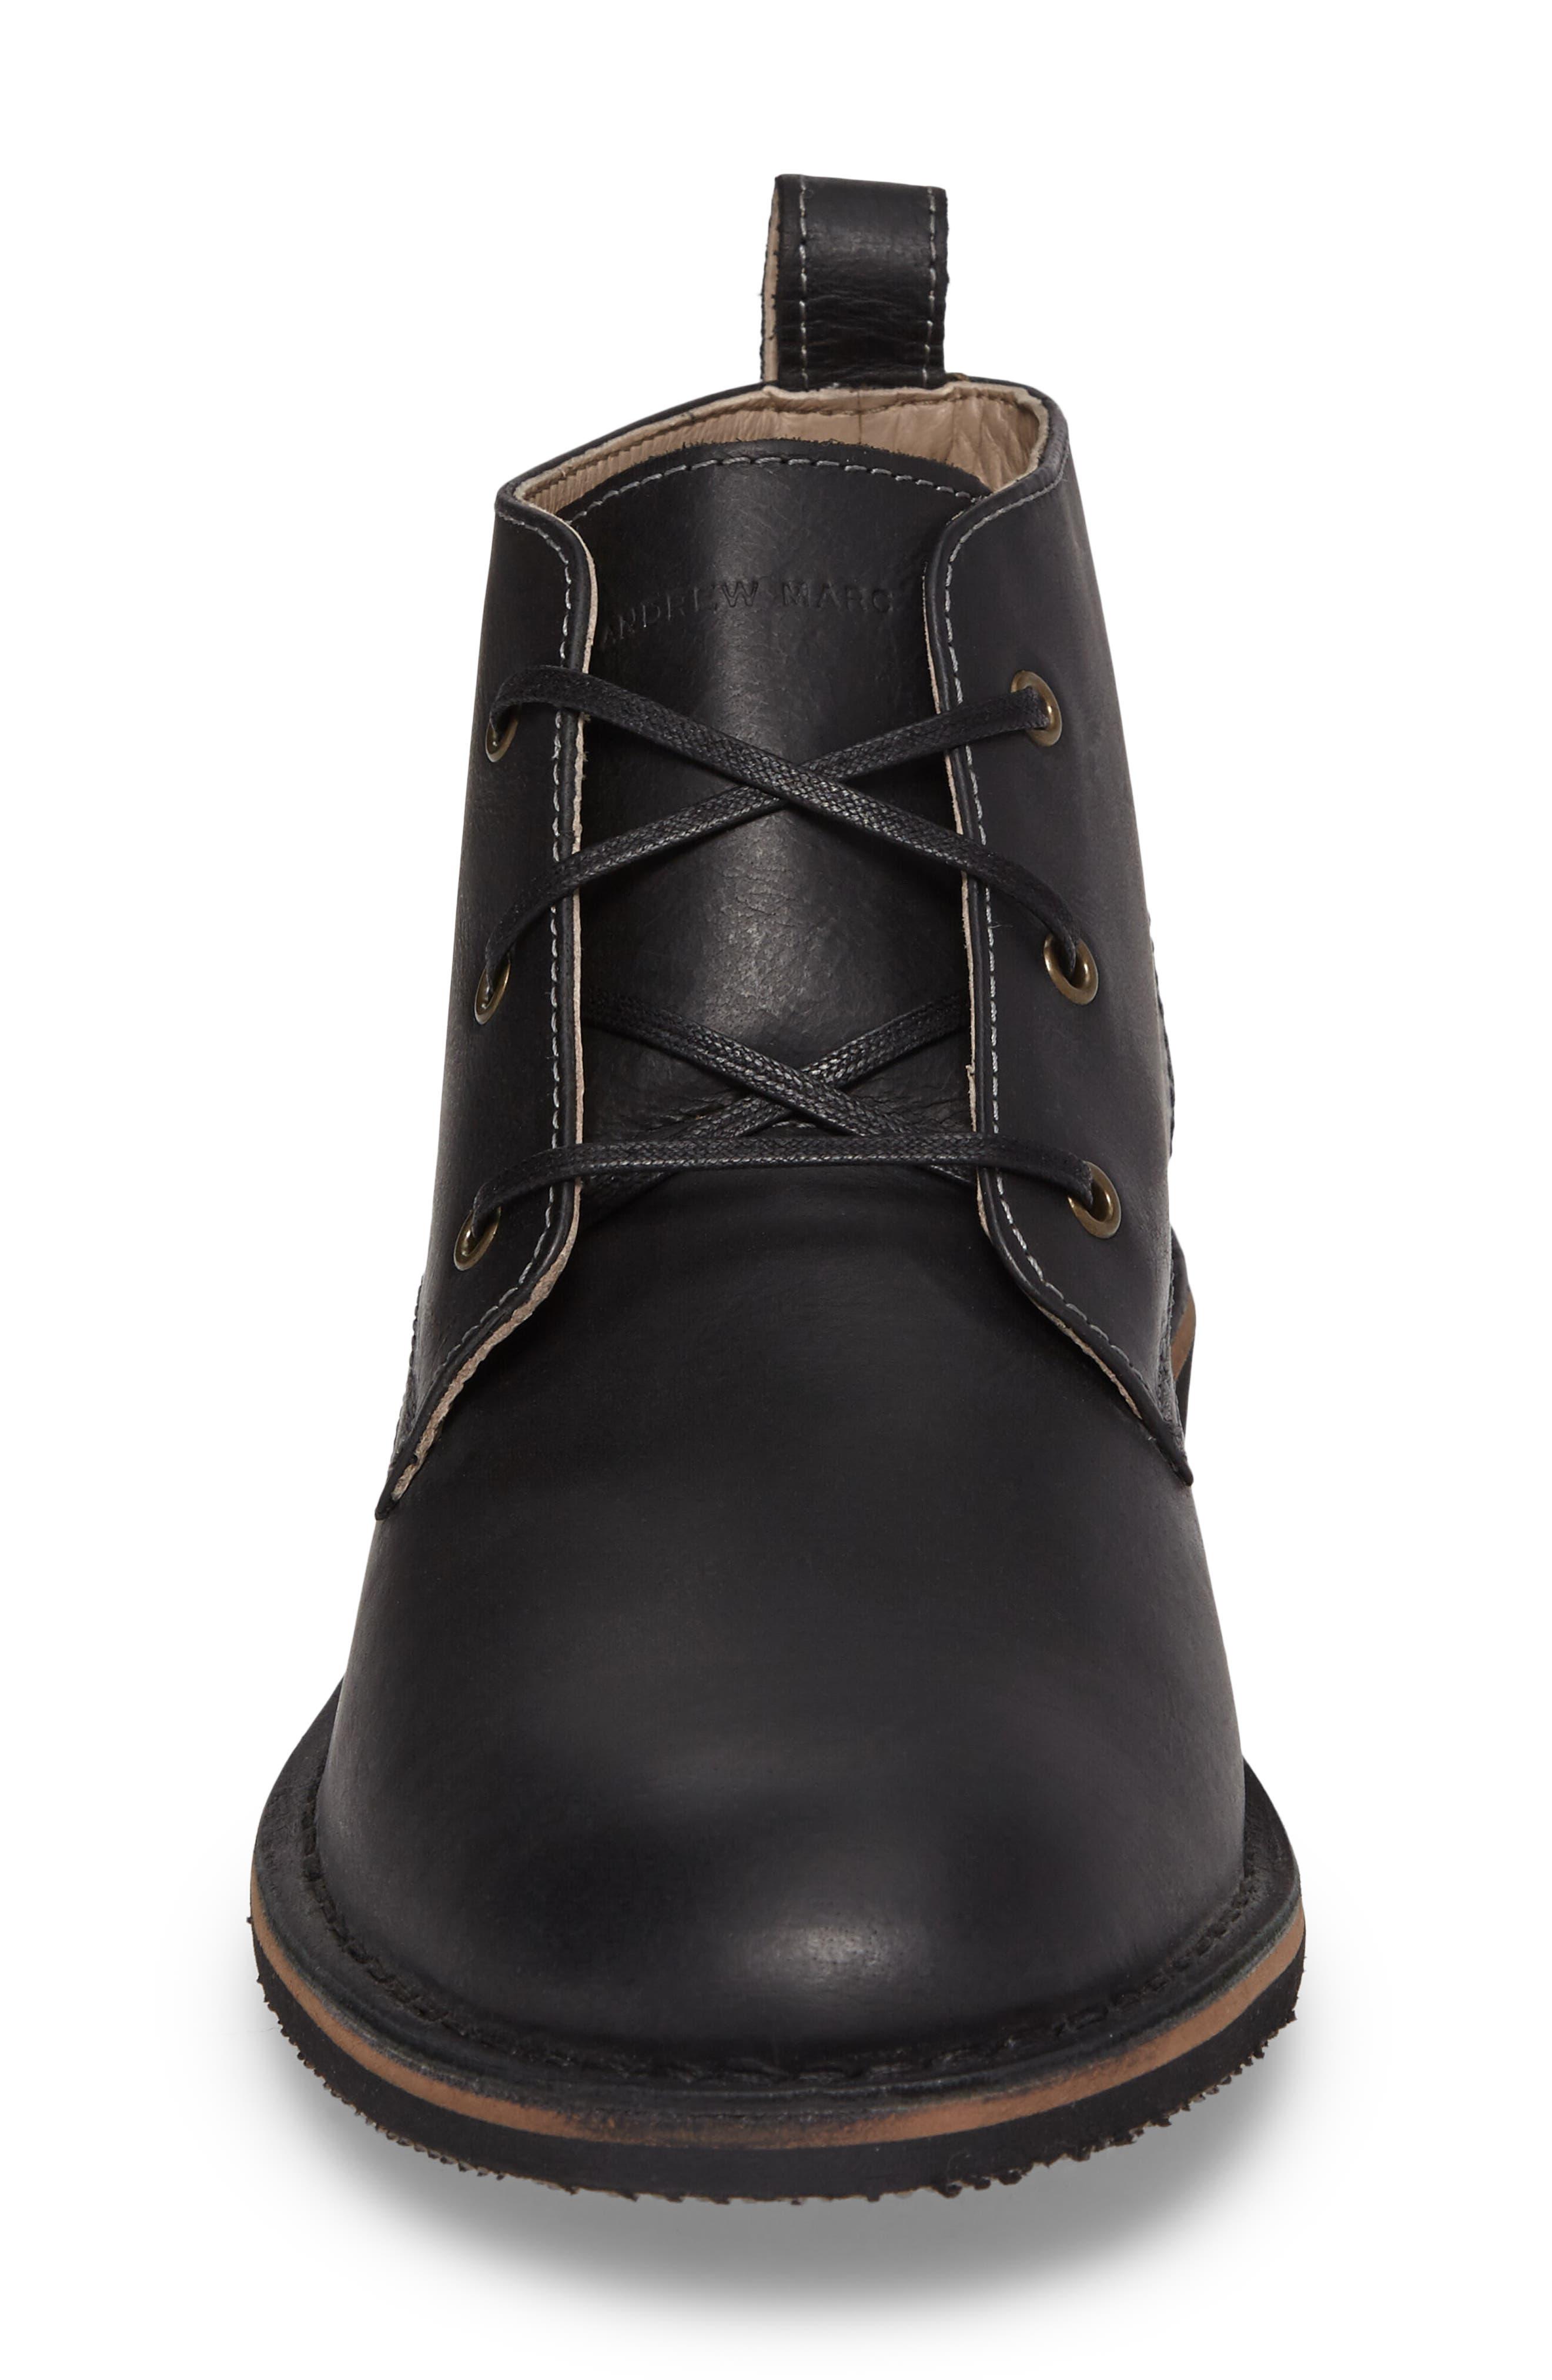 Dorchester Chukka Boot,                             Alternate thumbnail 4, color,                             001